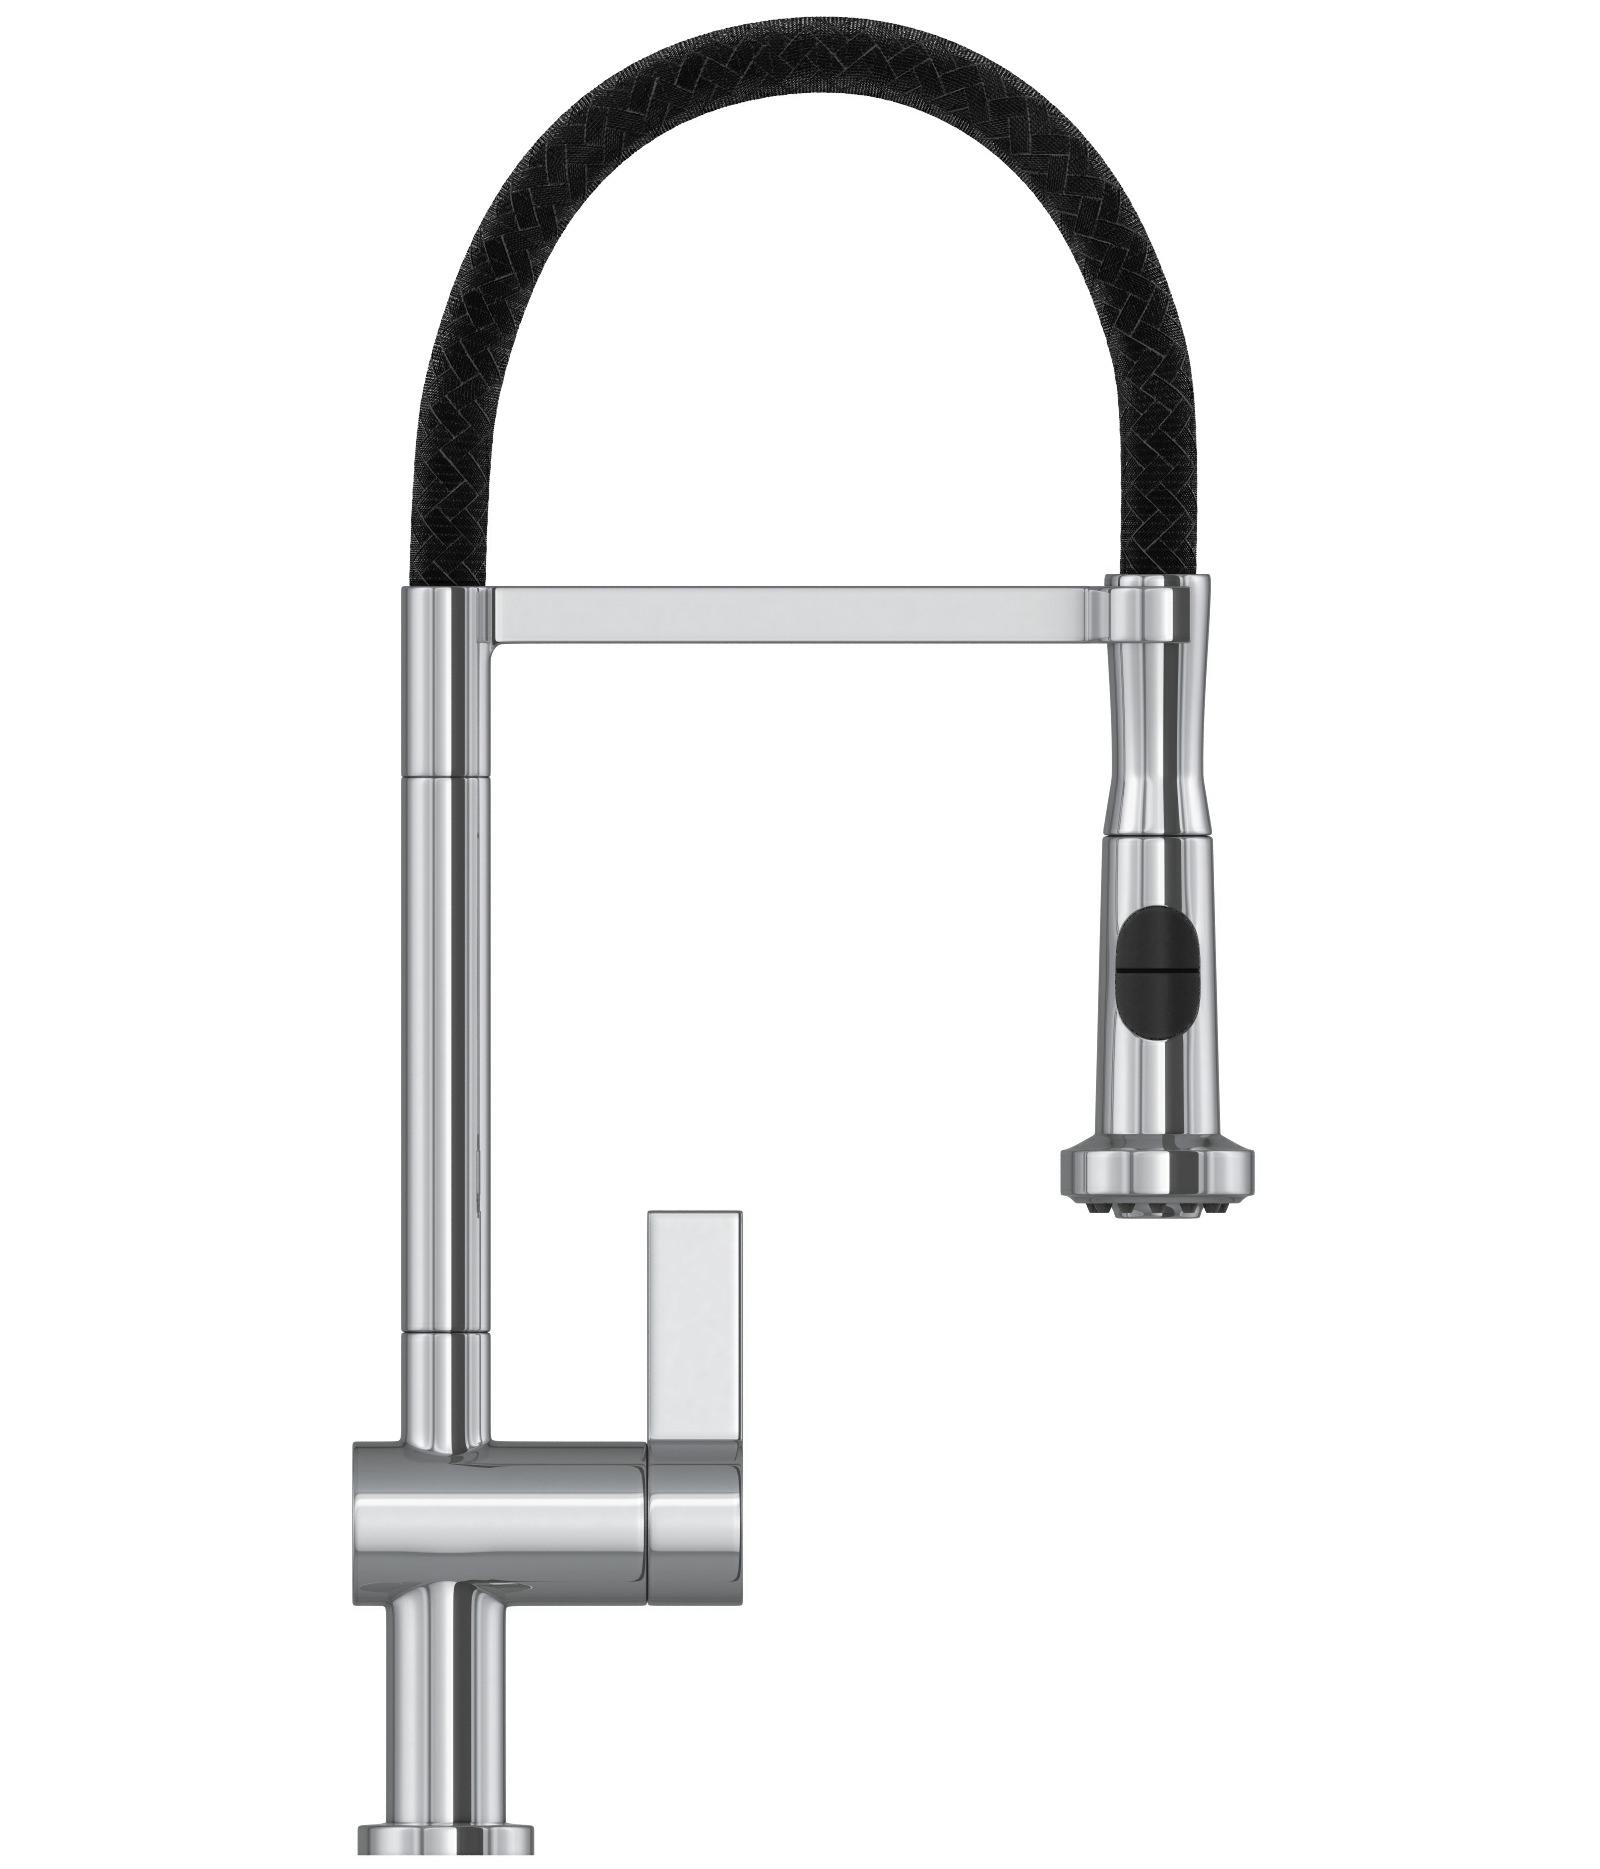 Sirino Pull-Out Spray - Chrome Kitchen Sink Mixer Tap